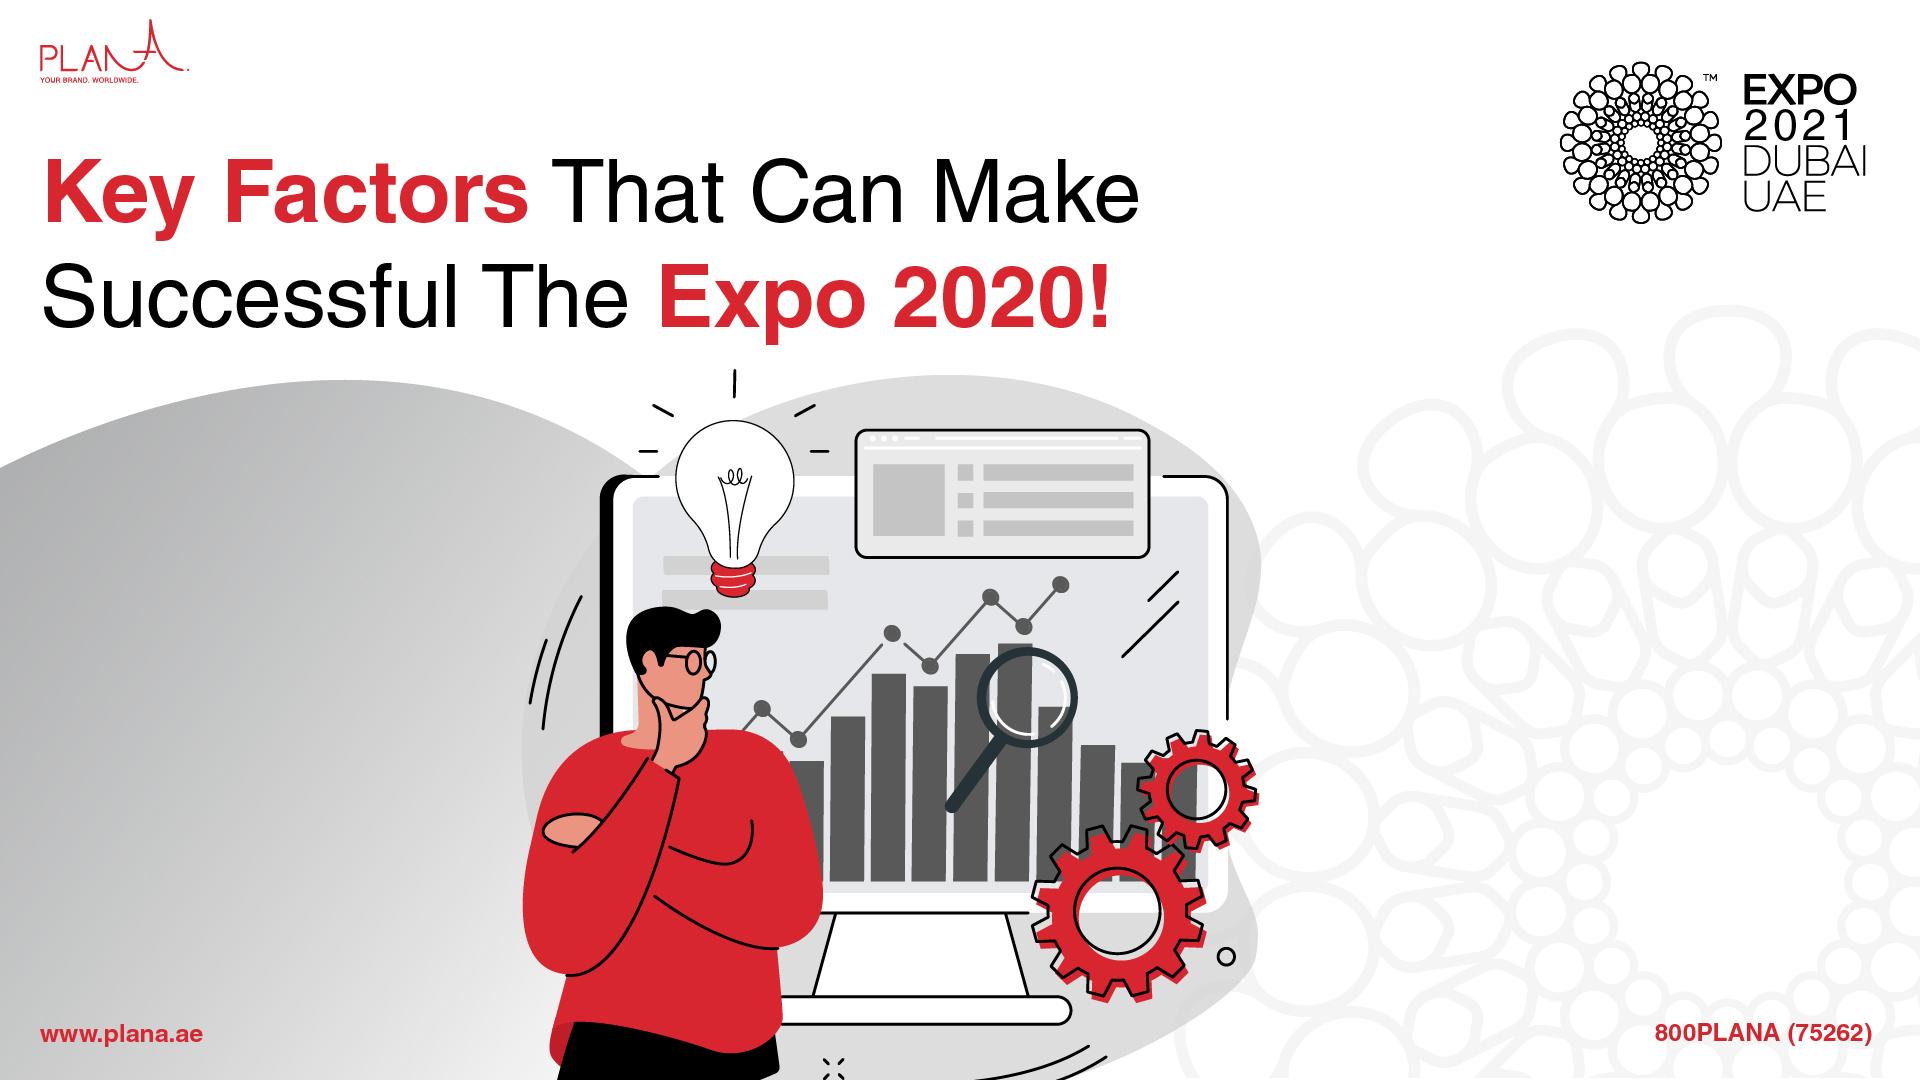 Key Factors That Can Make Dubai Expo 2020 Successful